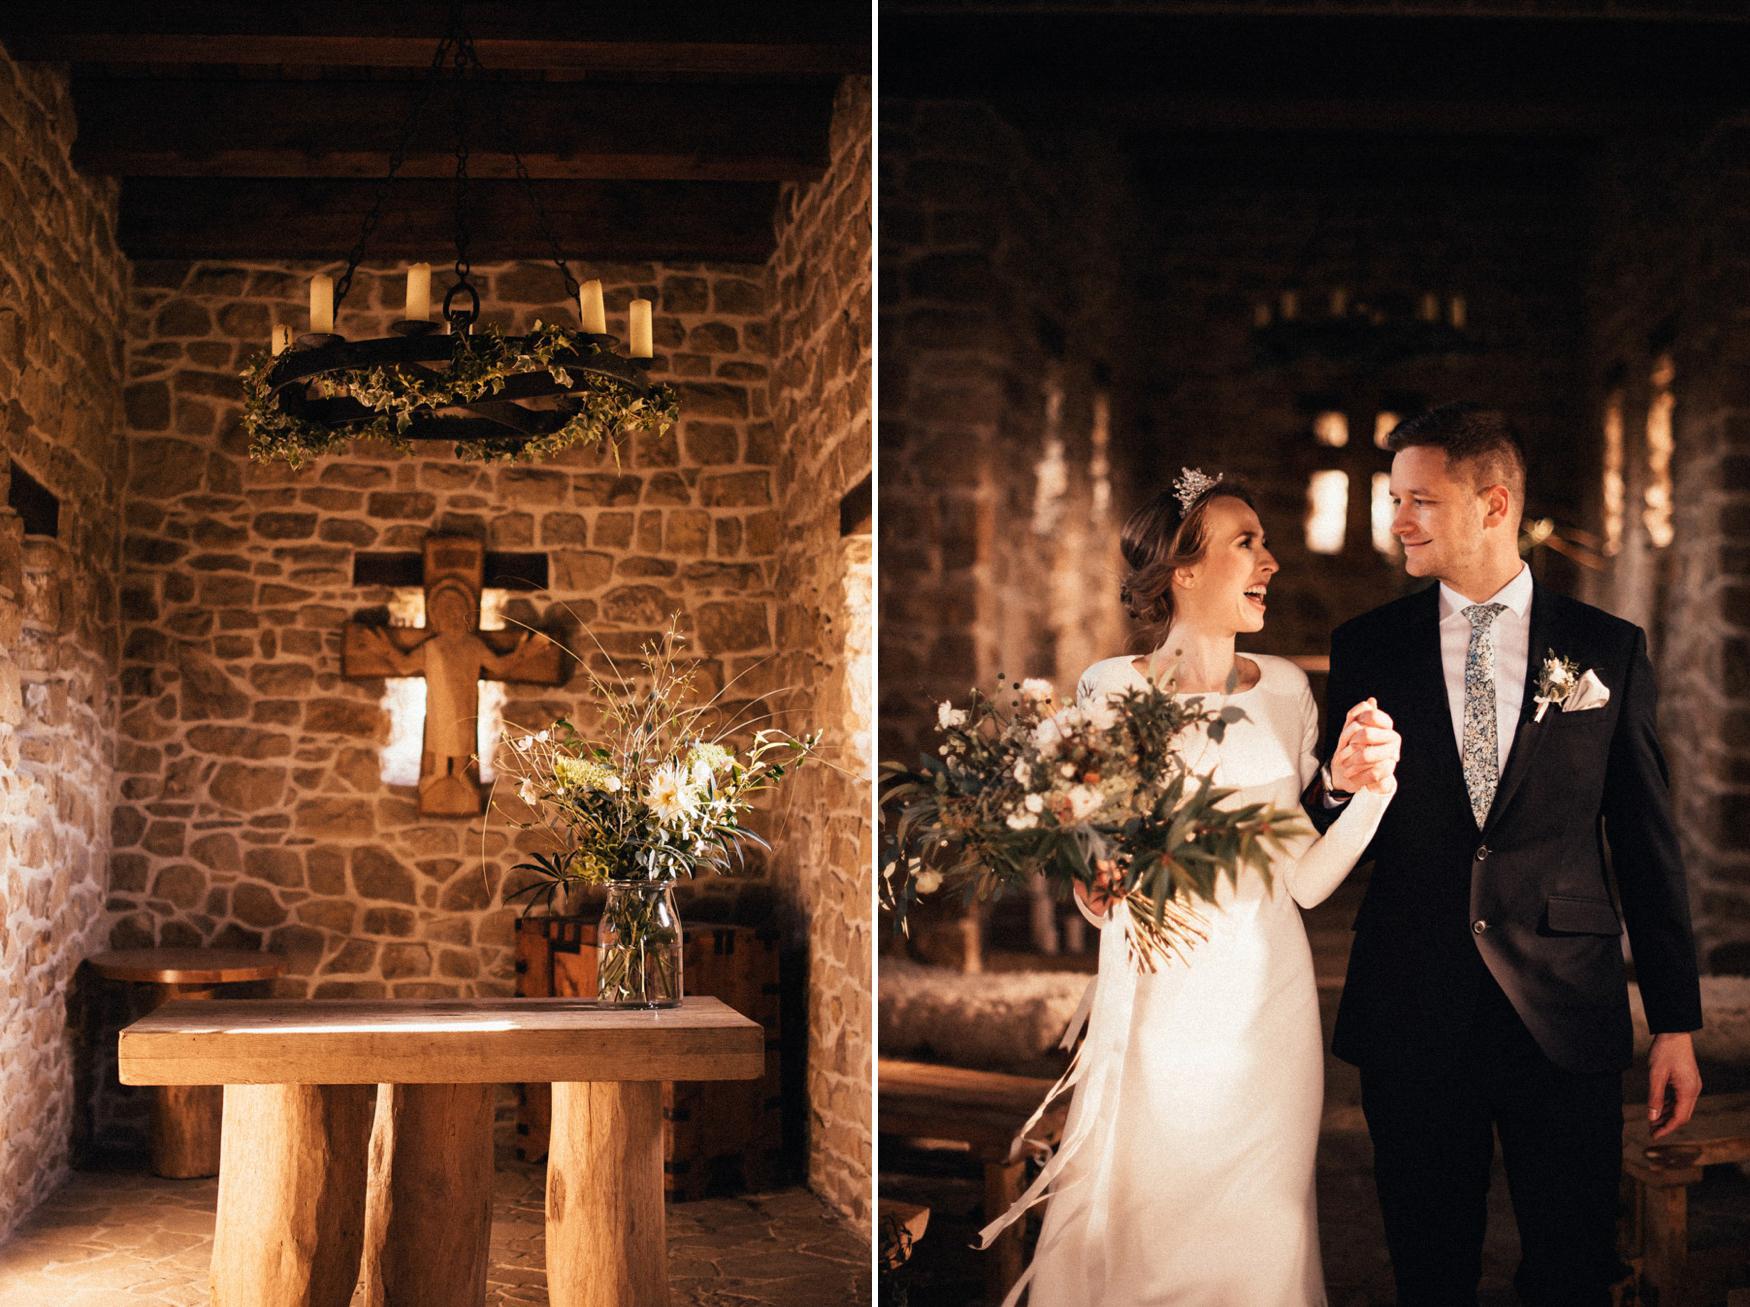 3 czech countryside rustic wedding - svatba zikmundov003.jpg